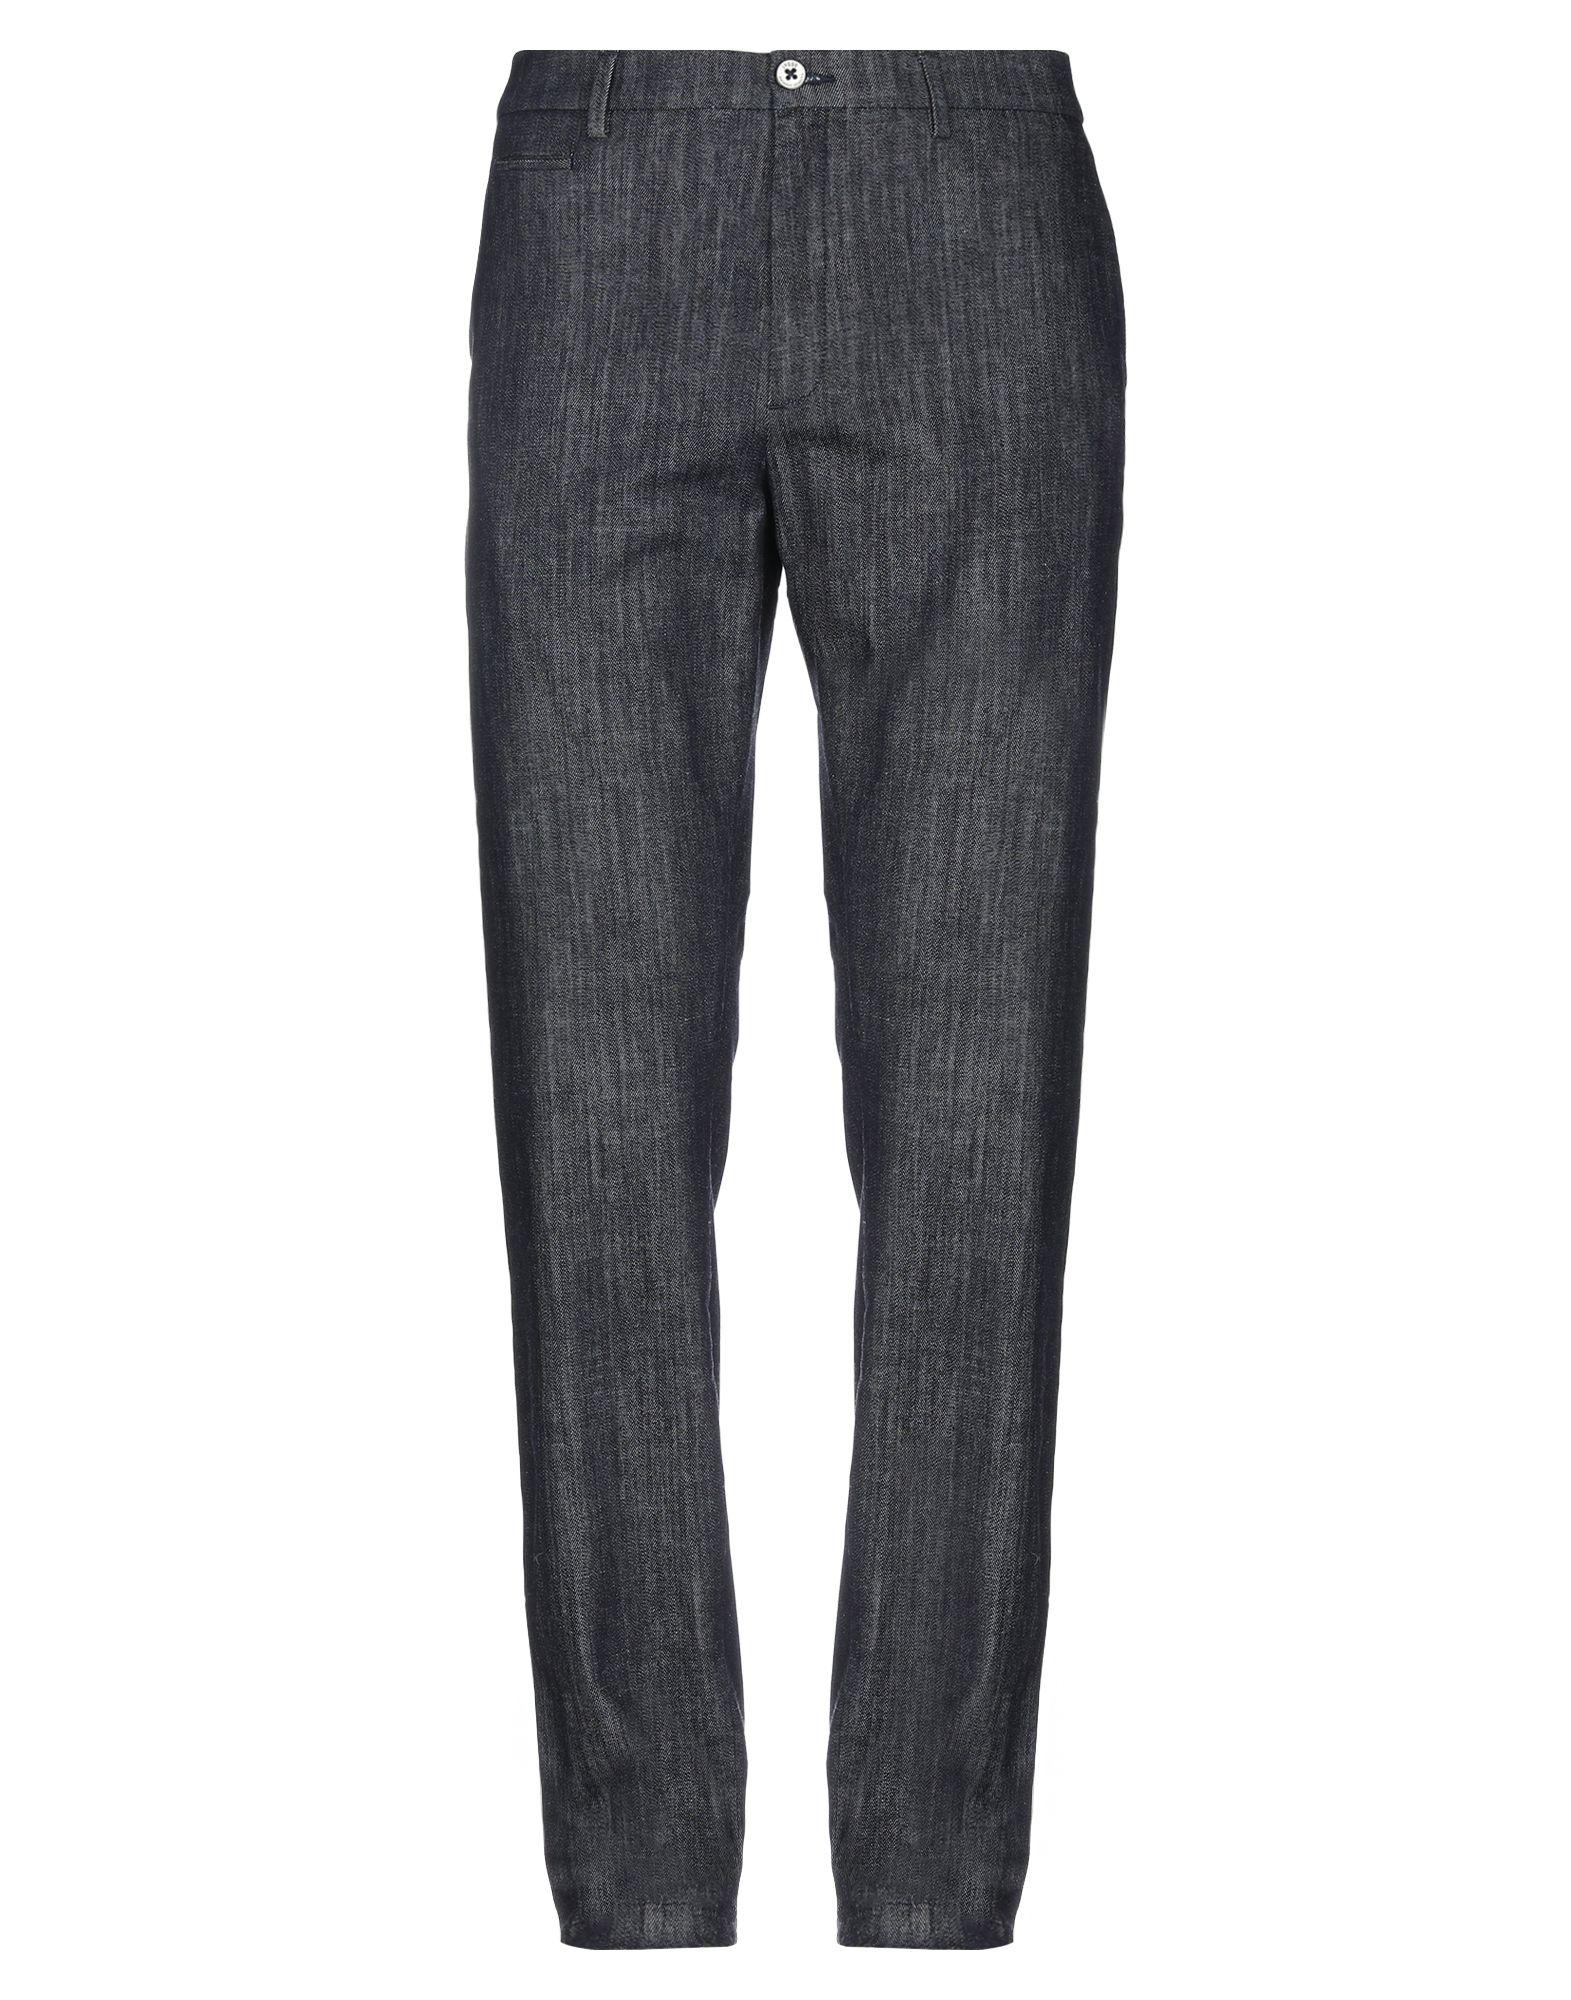 Pantaloni Jeans Jaggy uomo - 42759546EW 42759546EW  fabrik direkt